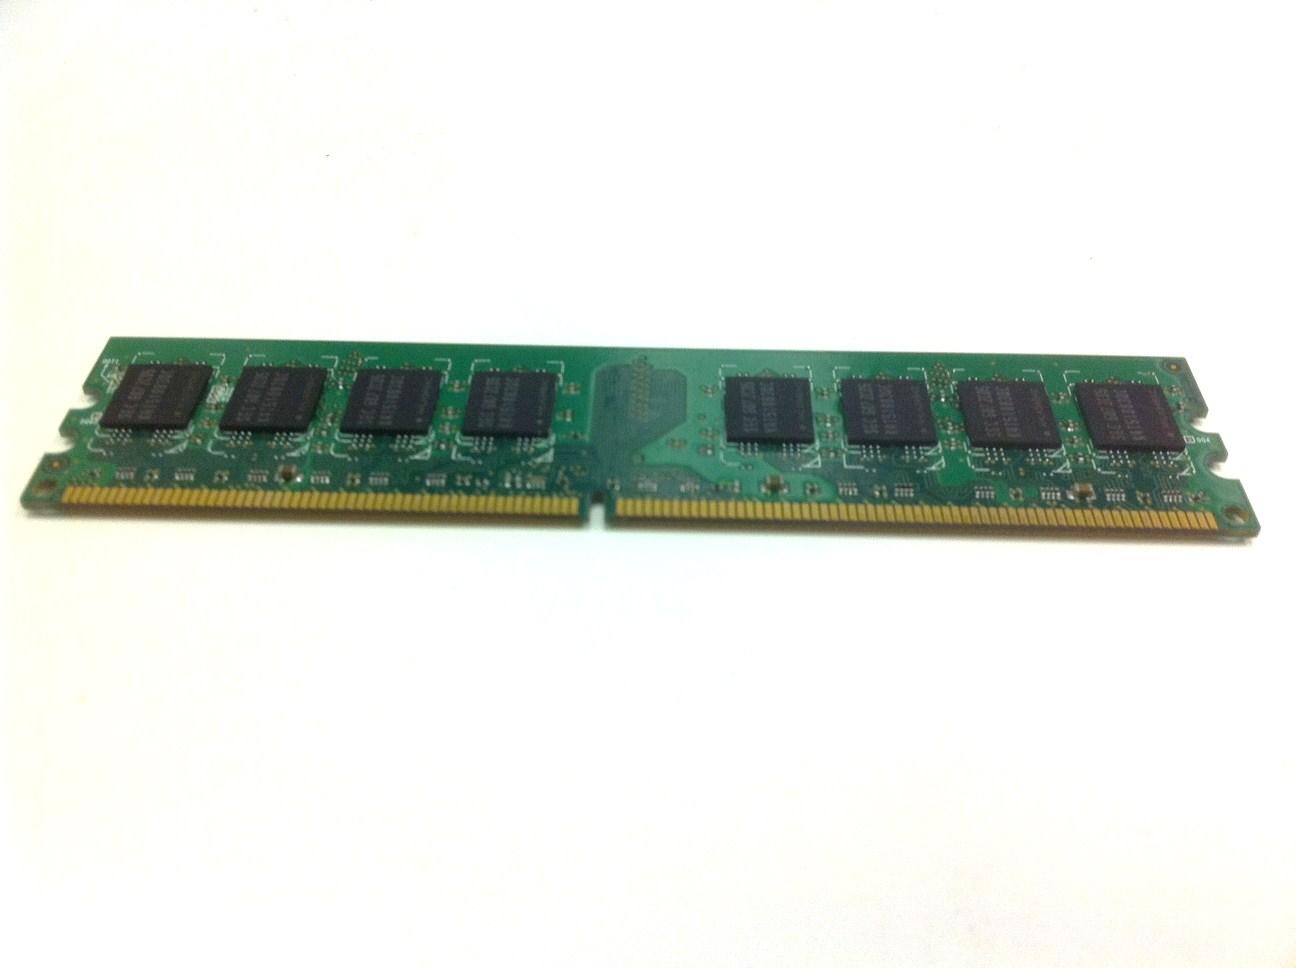 Samsung 1Gb Dimm Pc2-4200 533Mhz 2Rx8 Non-Ecc 240 Pin